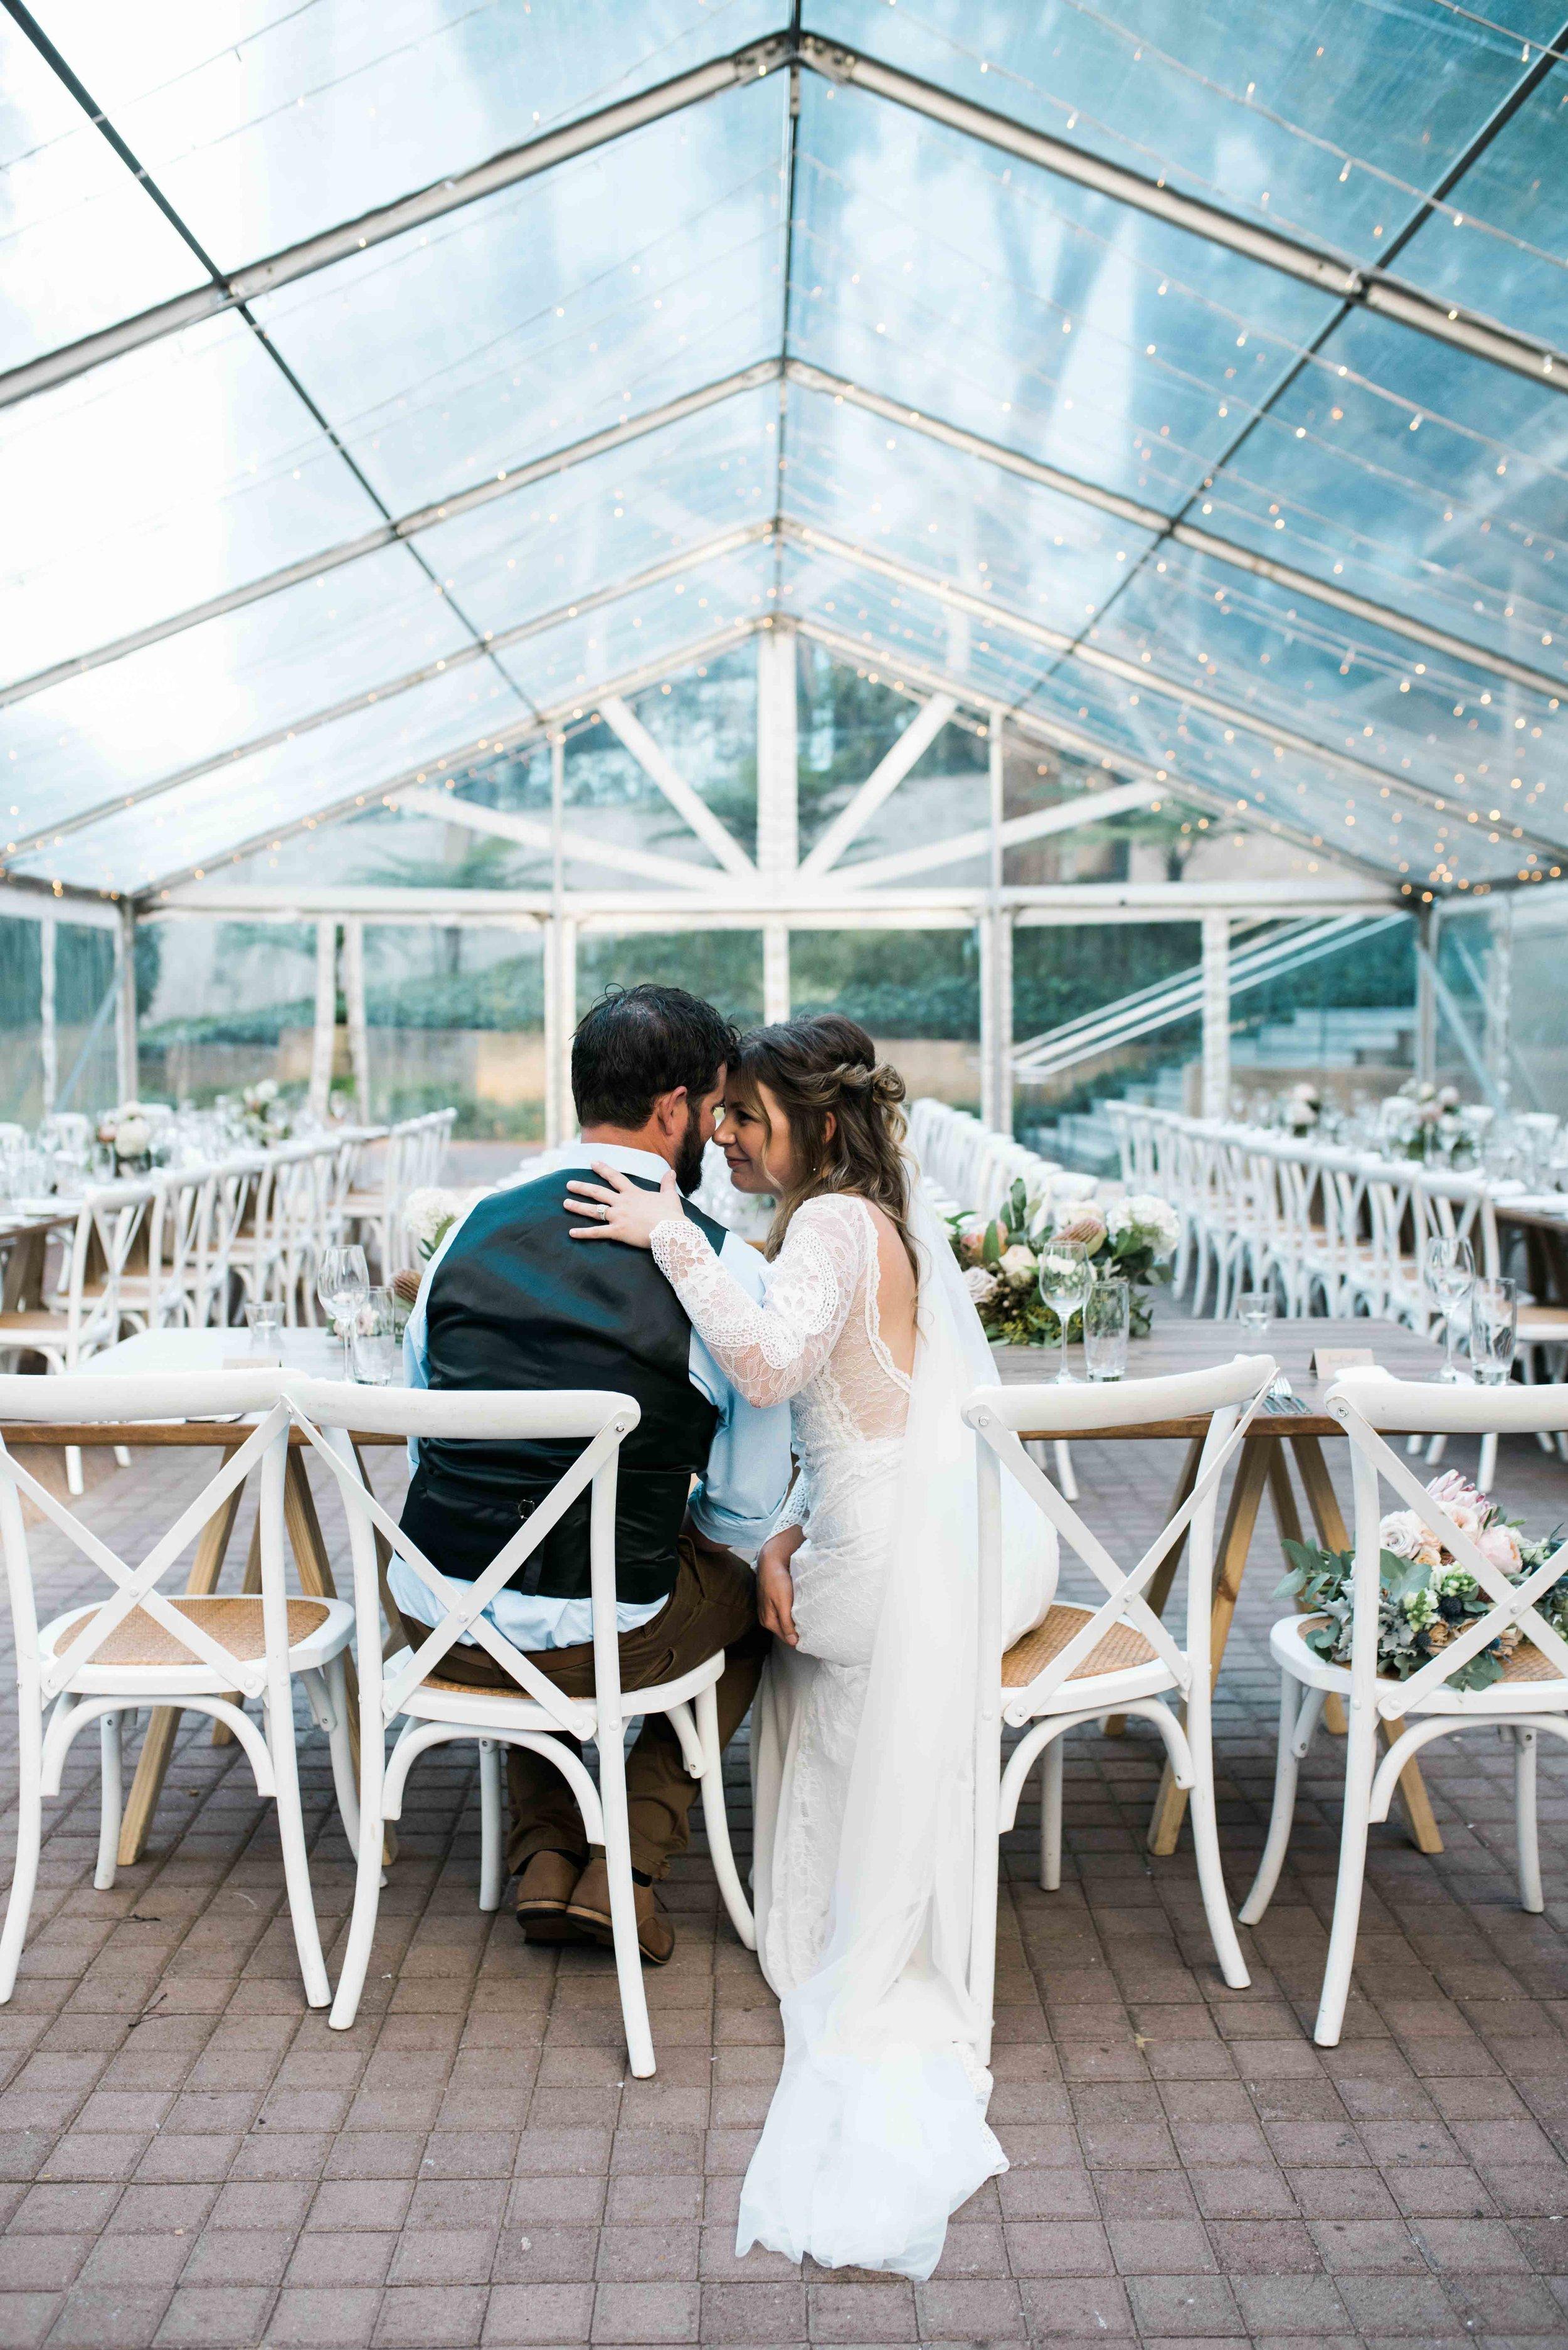 Wedding Planning & Styling